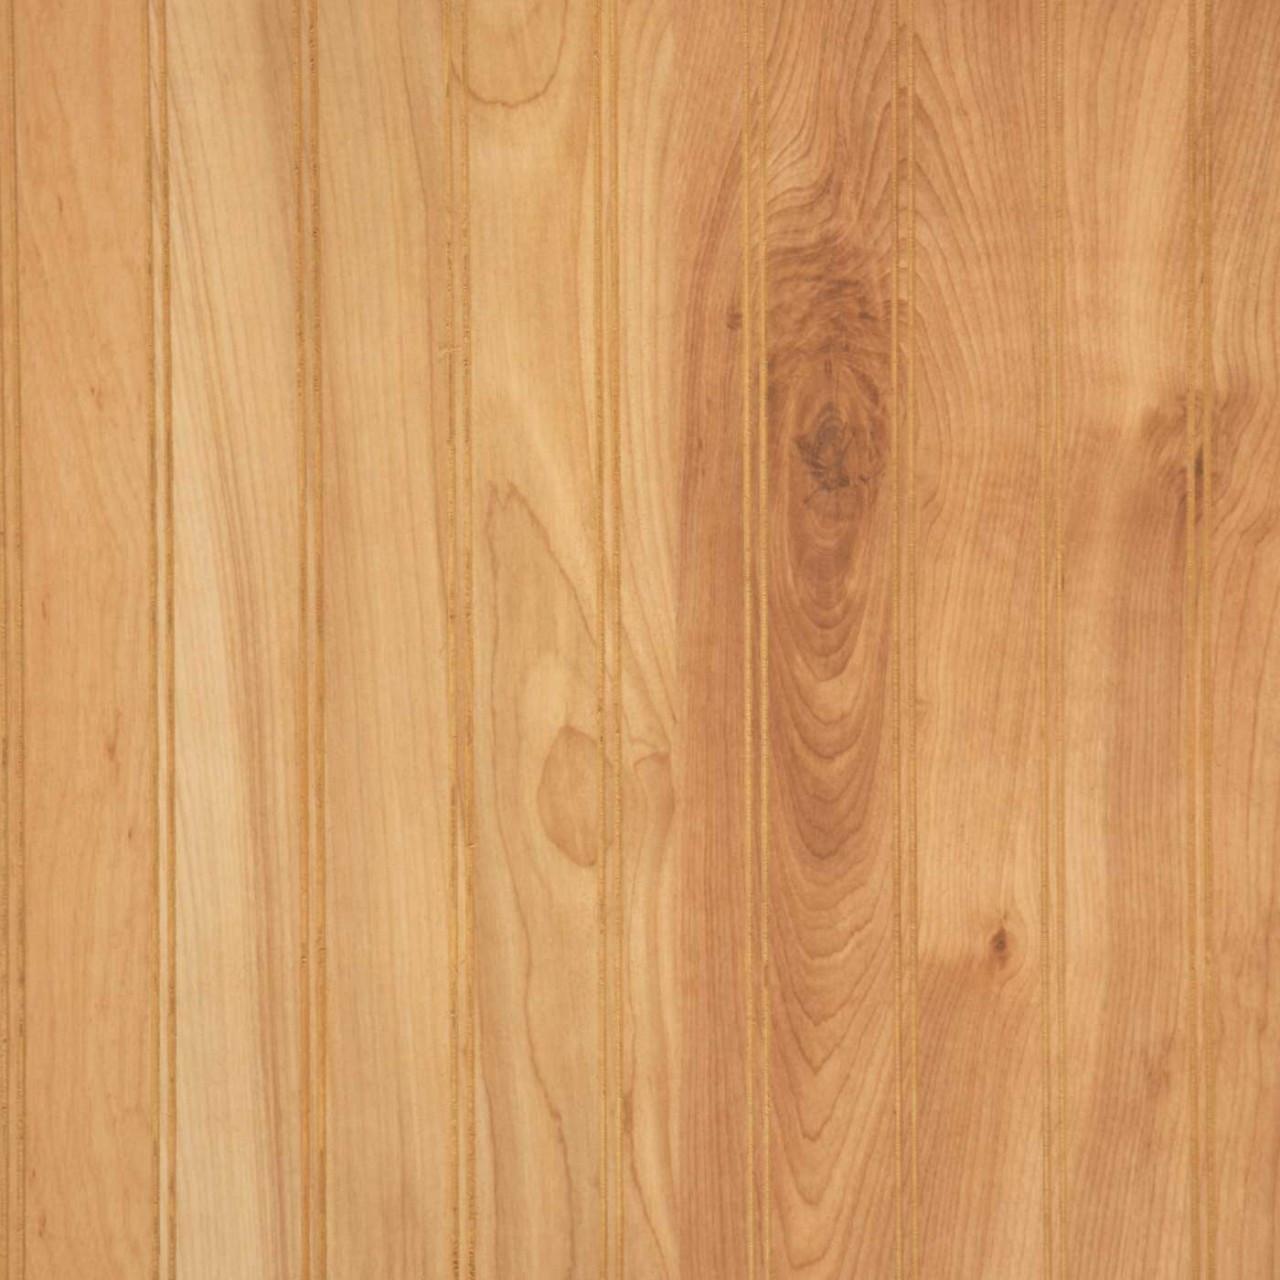 Natural Birch Paneling Wainscot BeadBoard